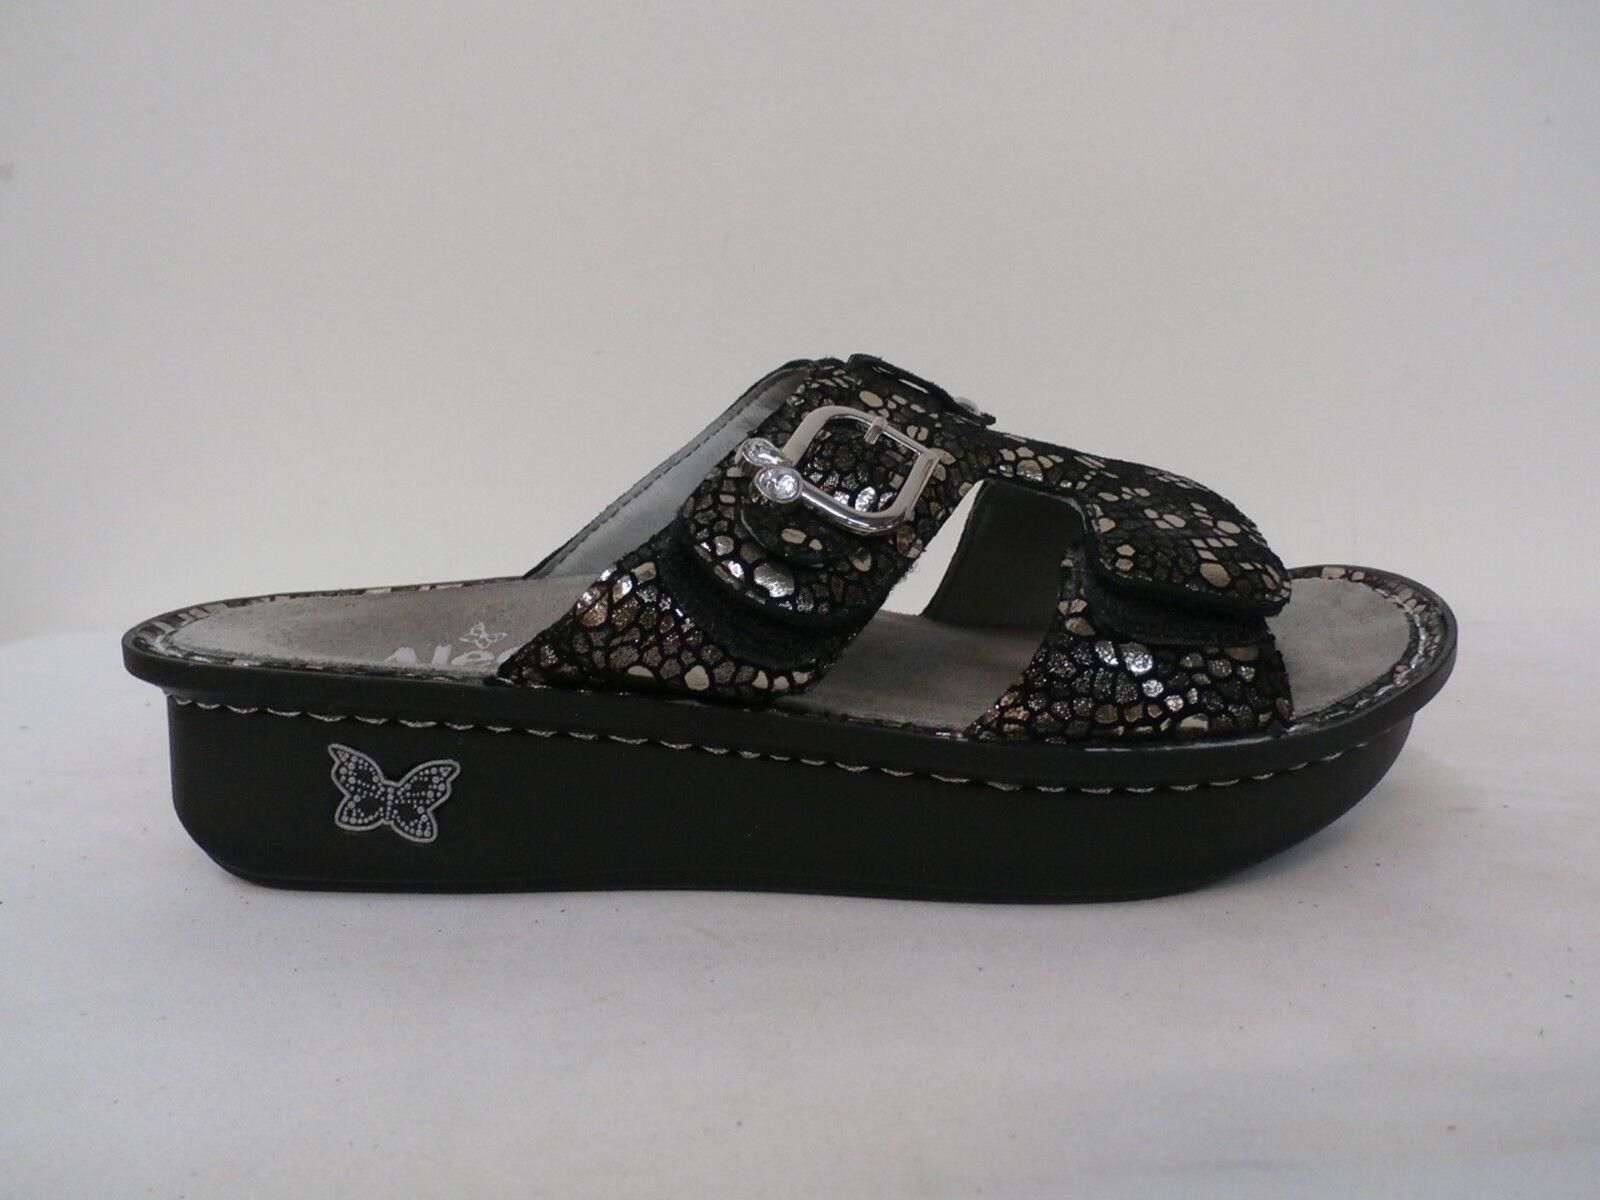 Alegria Leather Adjustable Slide Sandals - Peggy PEWTER MOSAIC Size 37 (7-7.5)